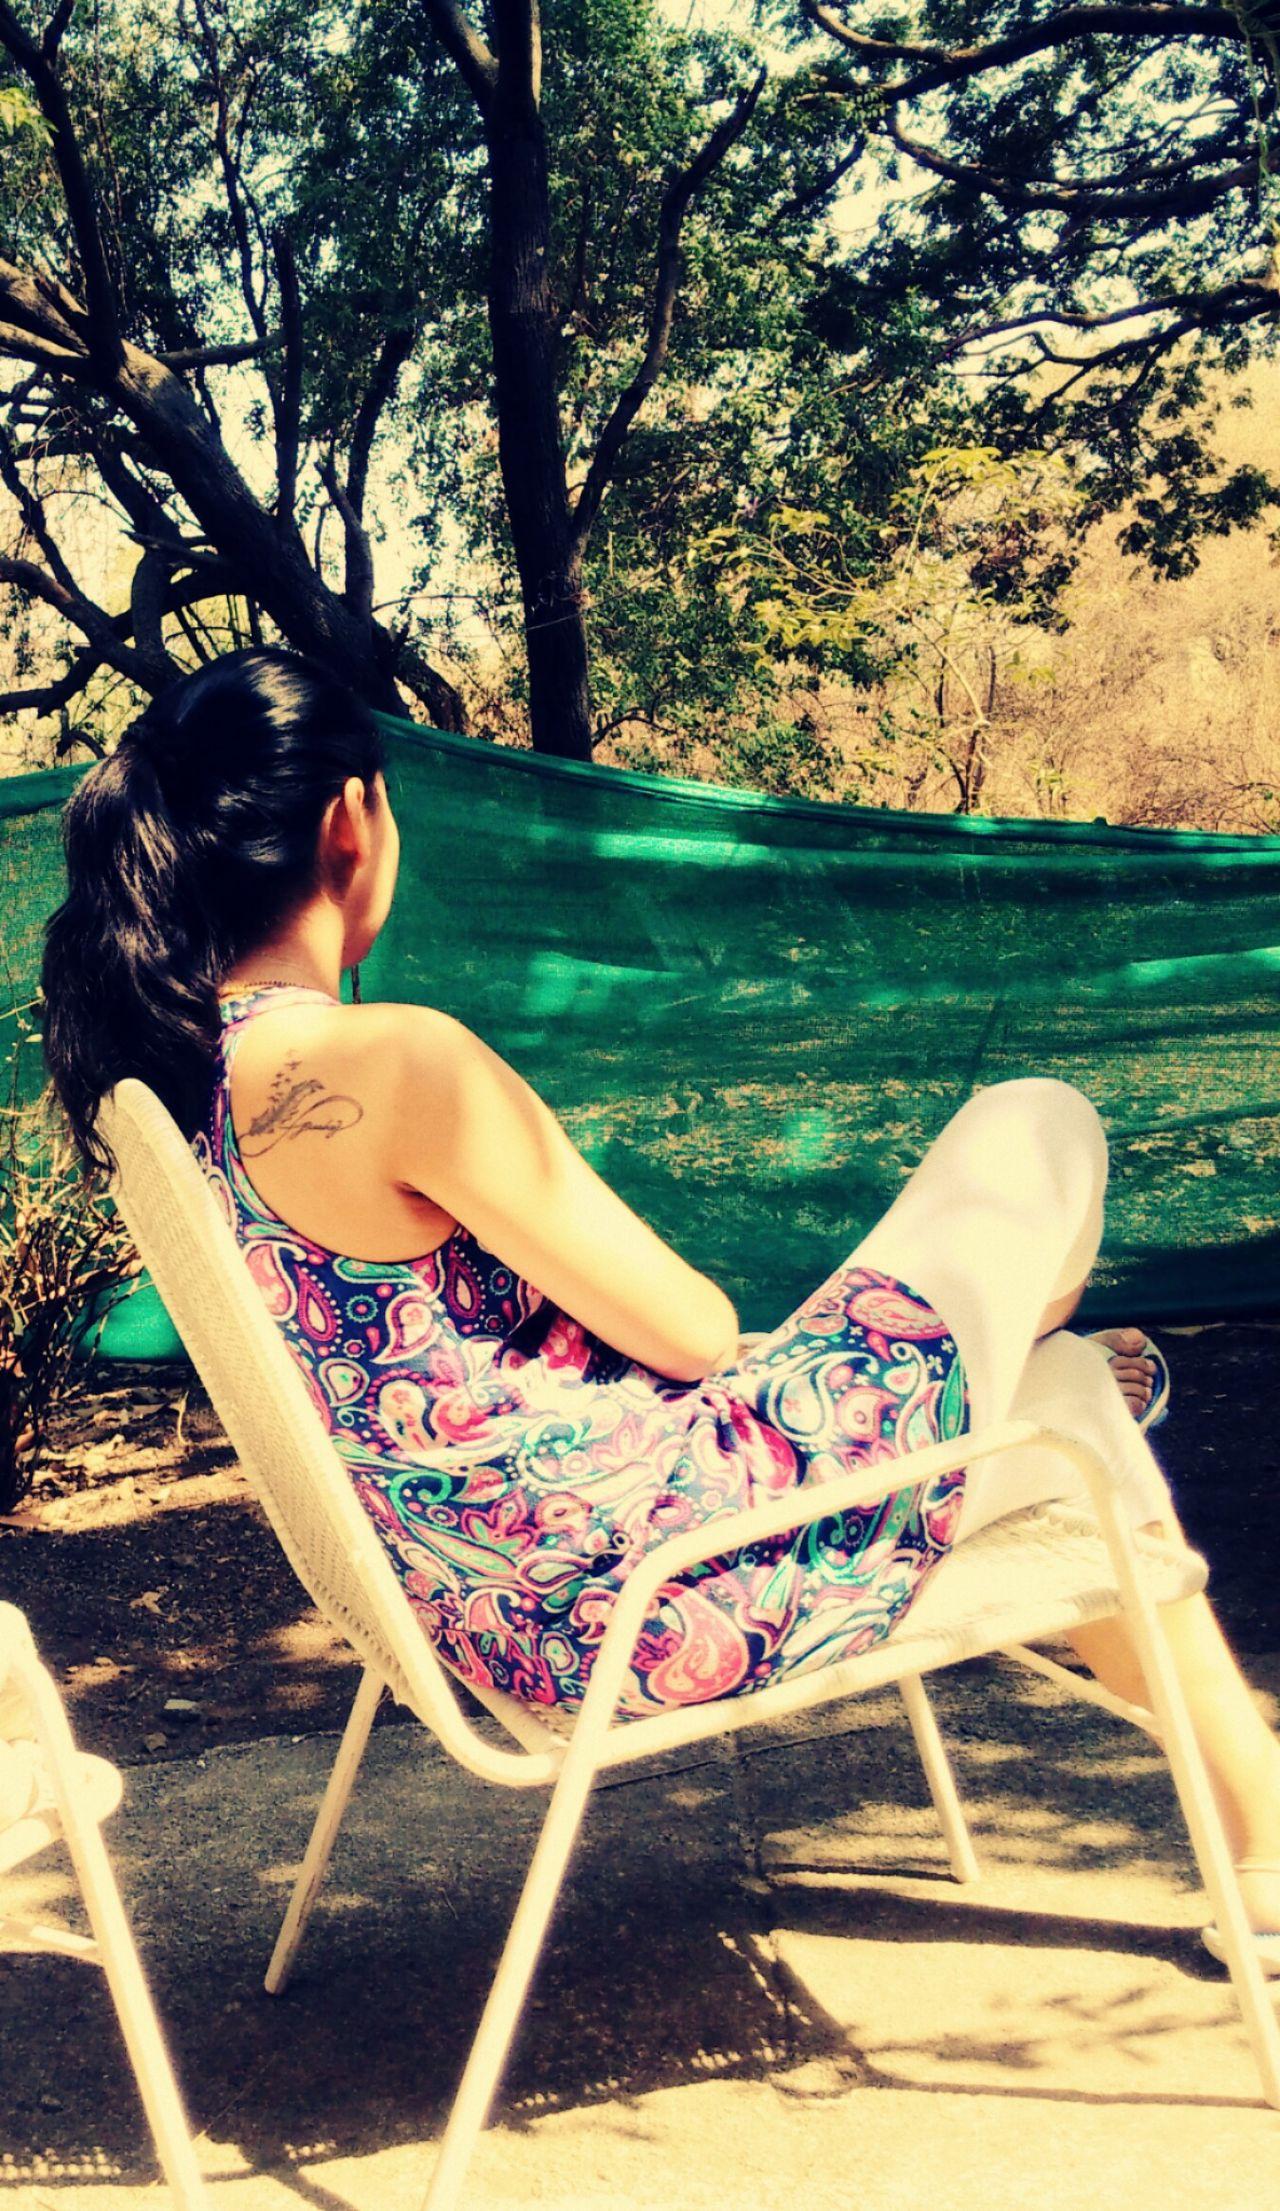 Peace And Quiet Backyard View INKEDGIRL Inkedback Chillaxing EyeEmNewHere